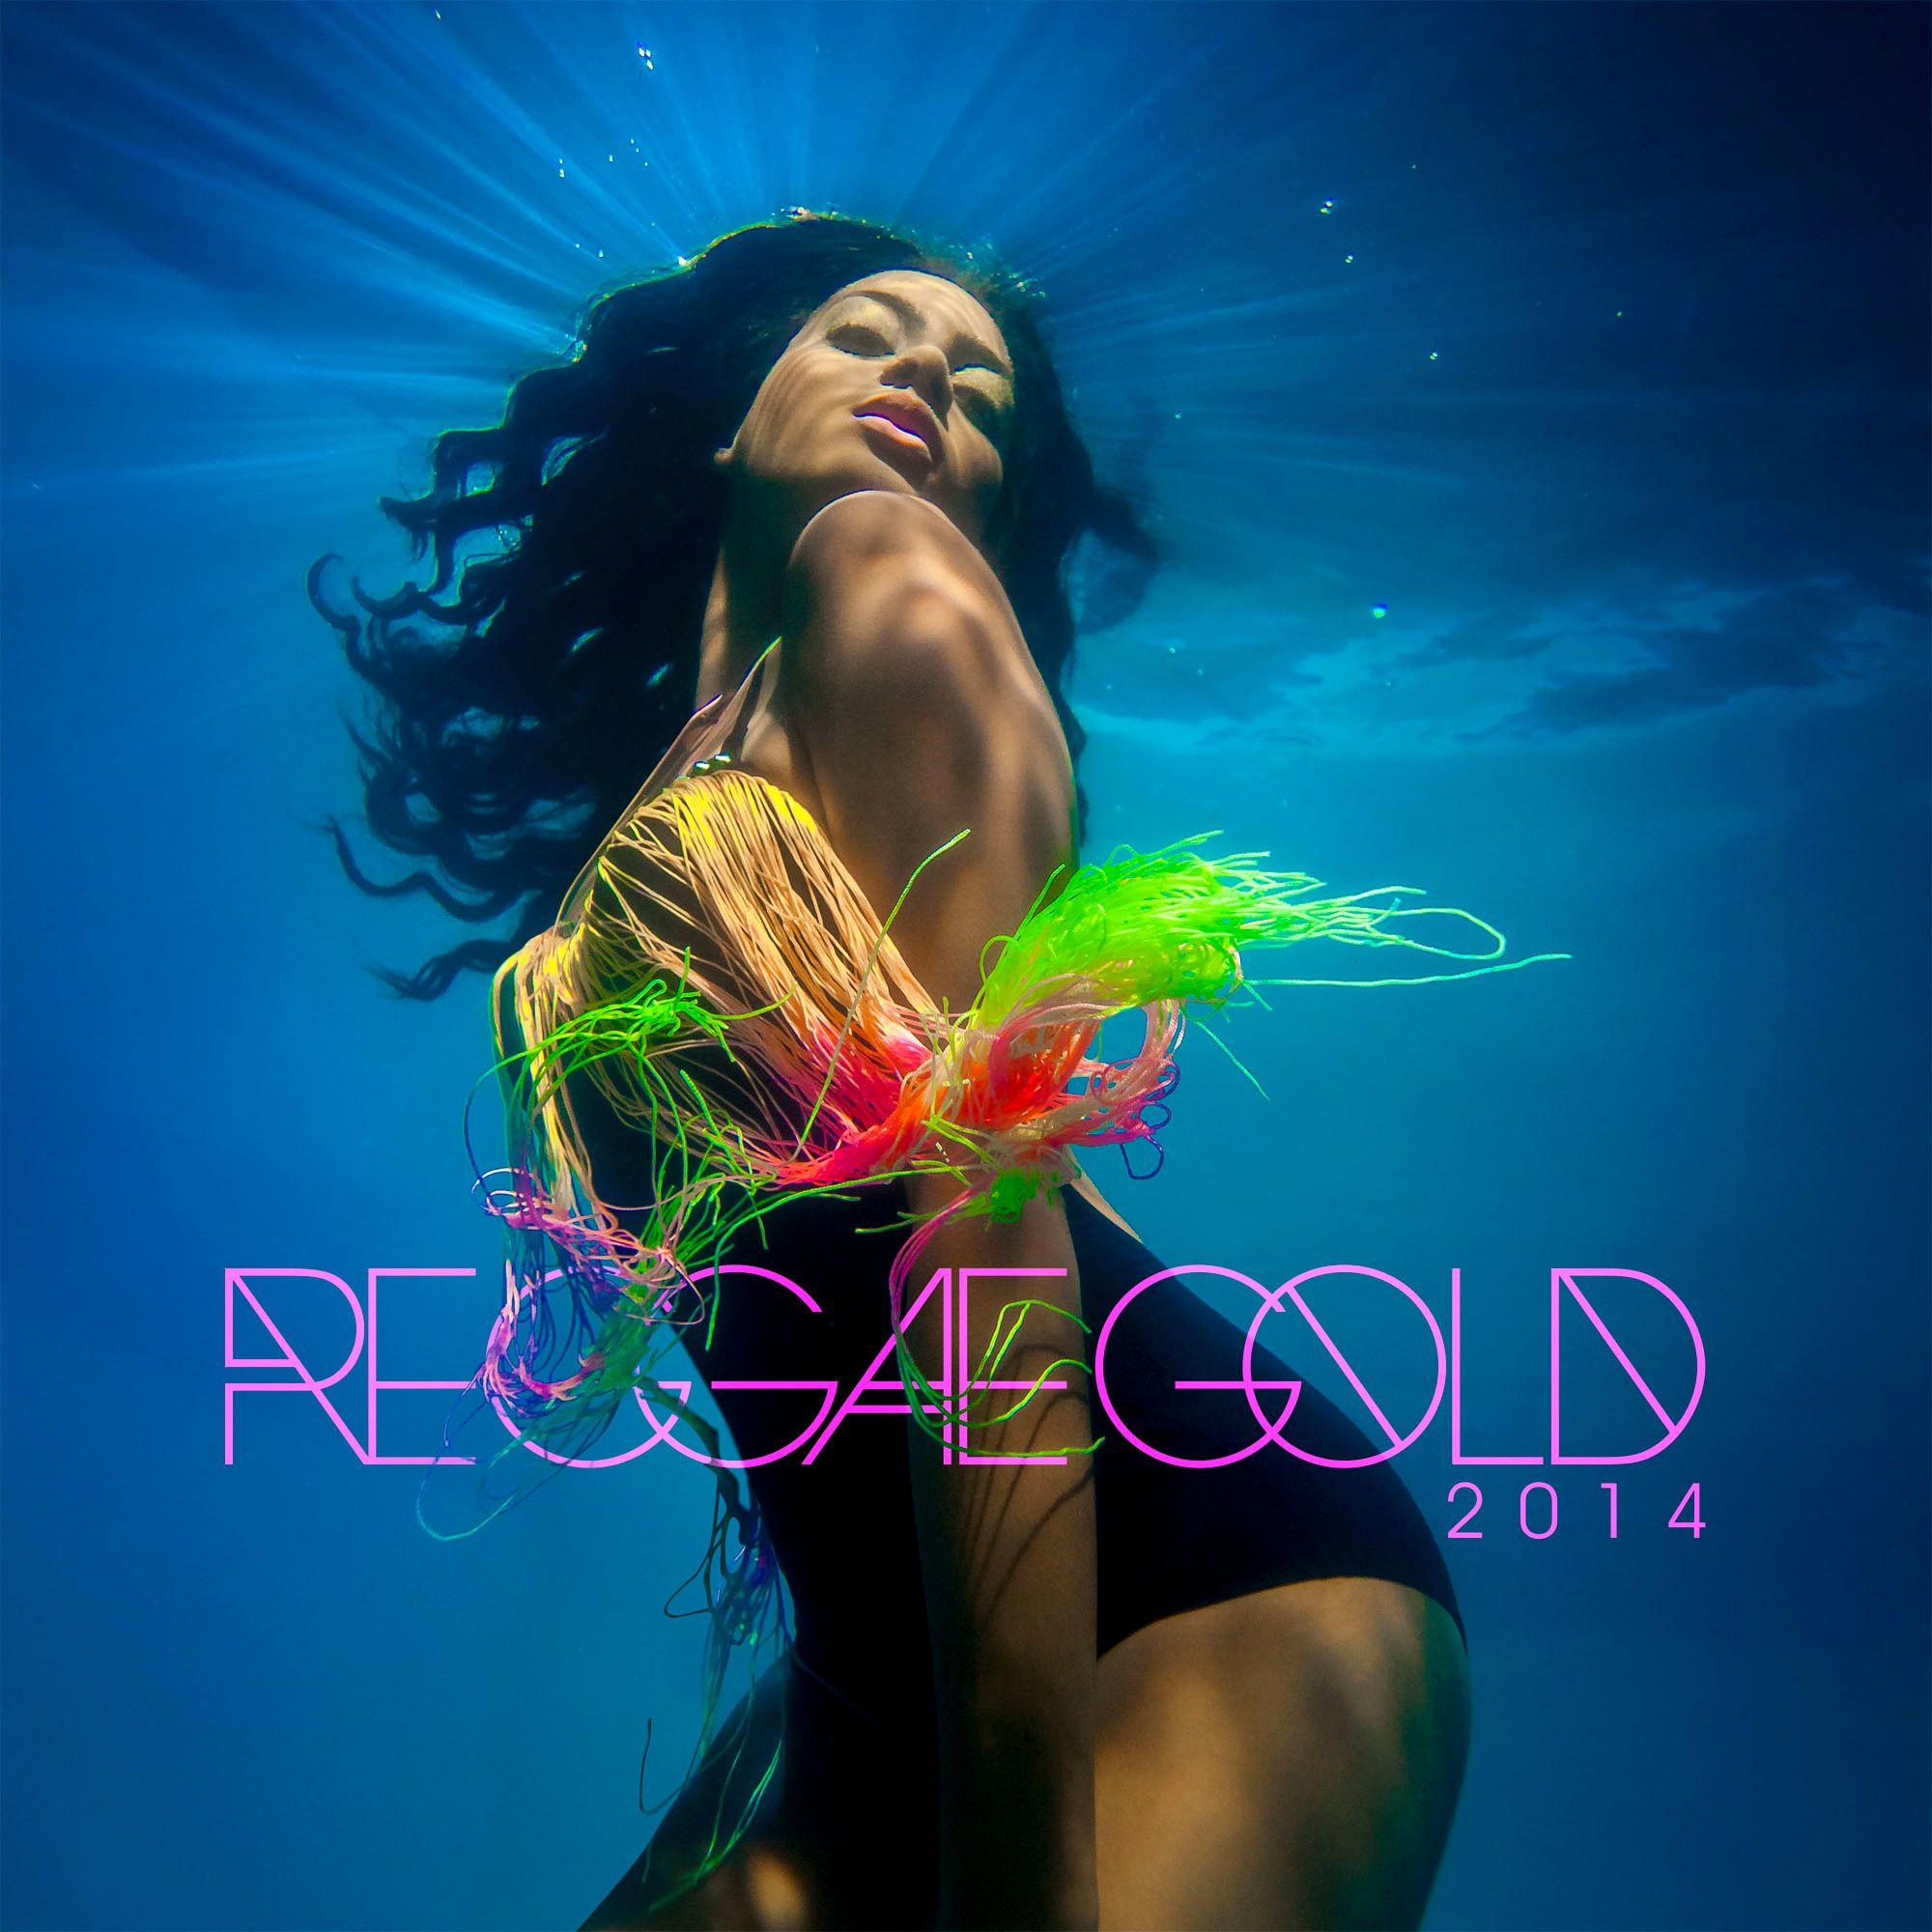 1reggae_gold_2014_cover